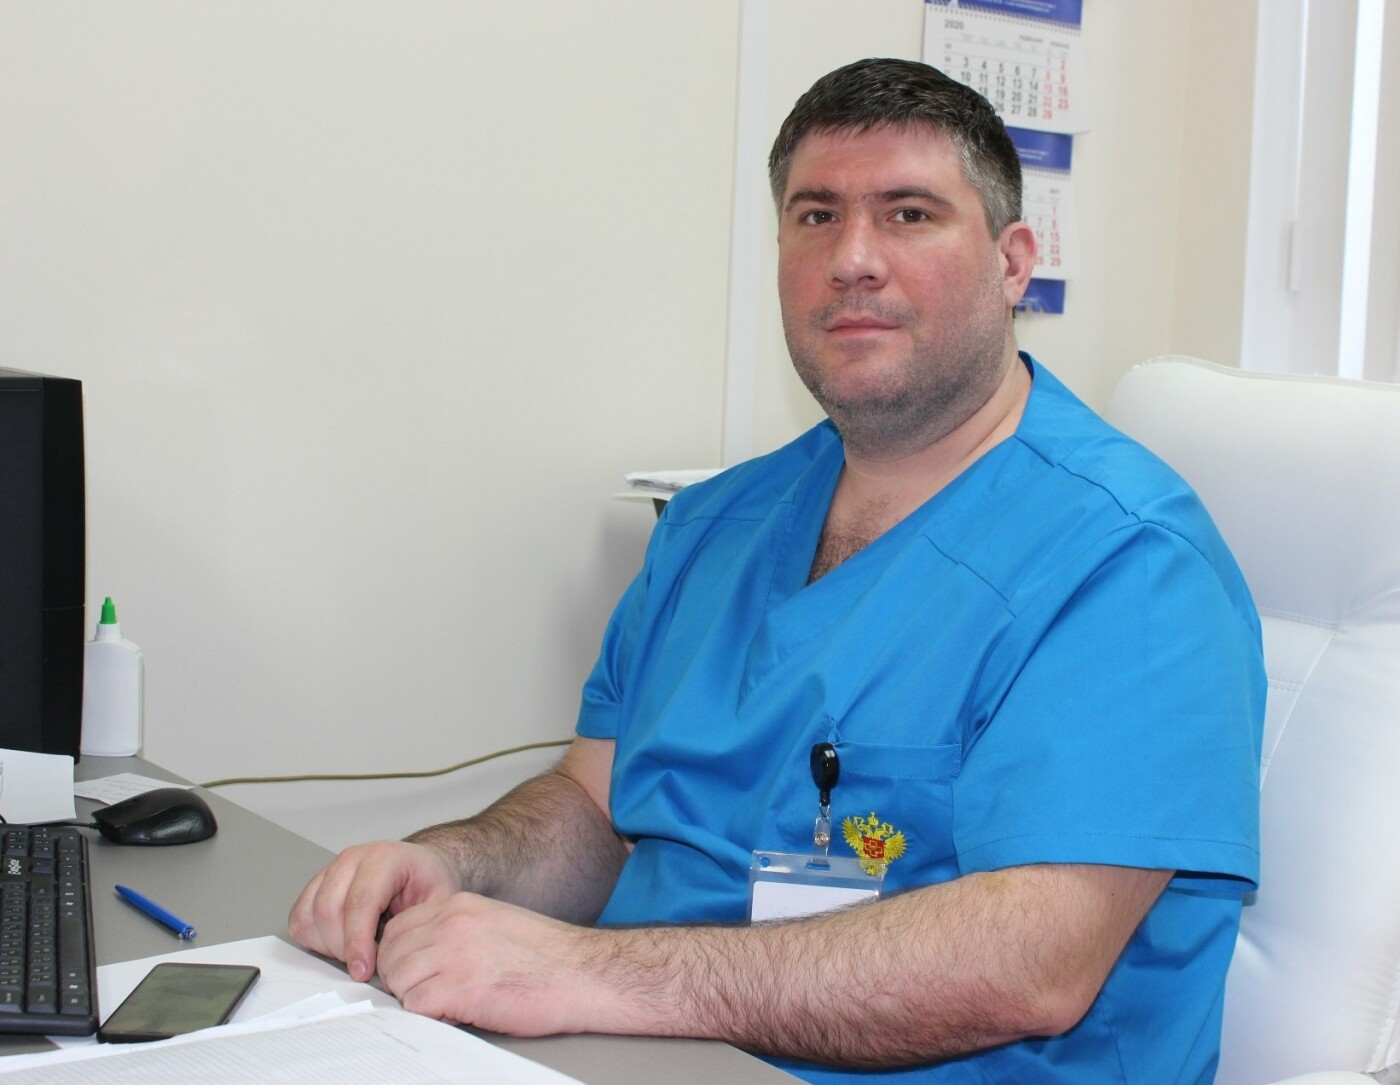 Димитровградские хирурги сохранили здоровье мужчине, тяжело травмированному в ДТП, фото-1